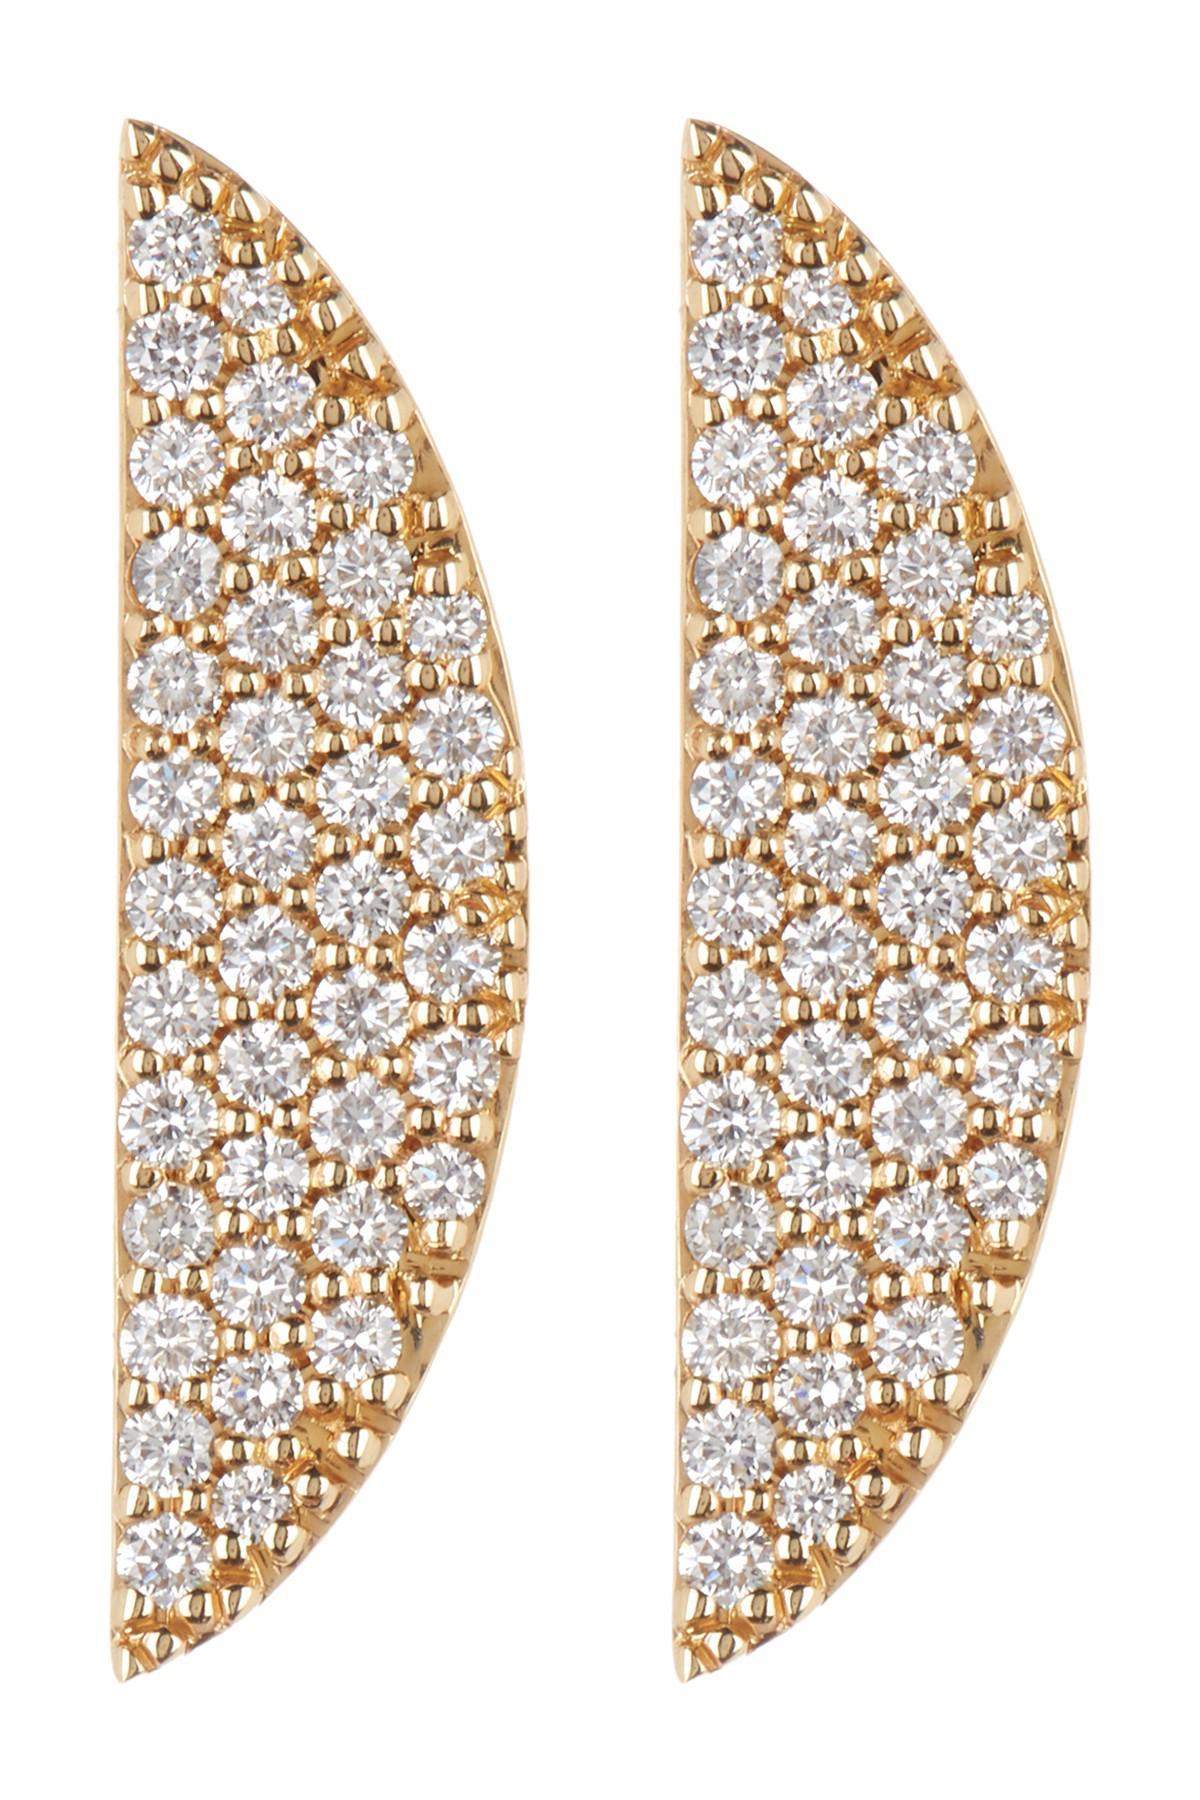 286eeb17a Lana Jewelry 14k Gold Flawless Eclipse Diamond Pave Earrings - 0.58 ...